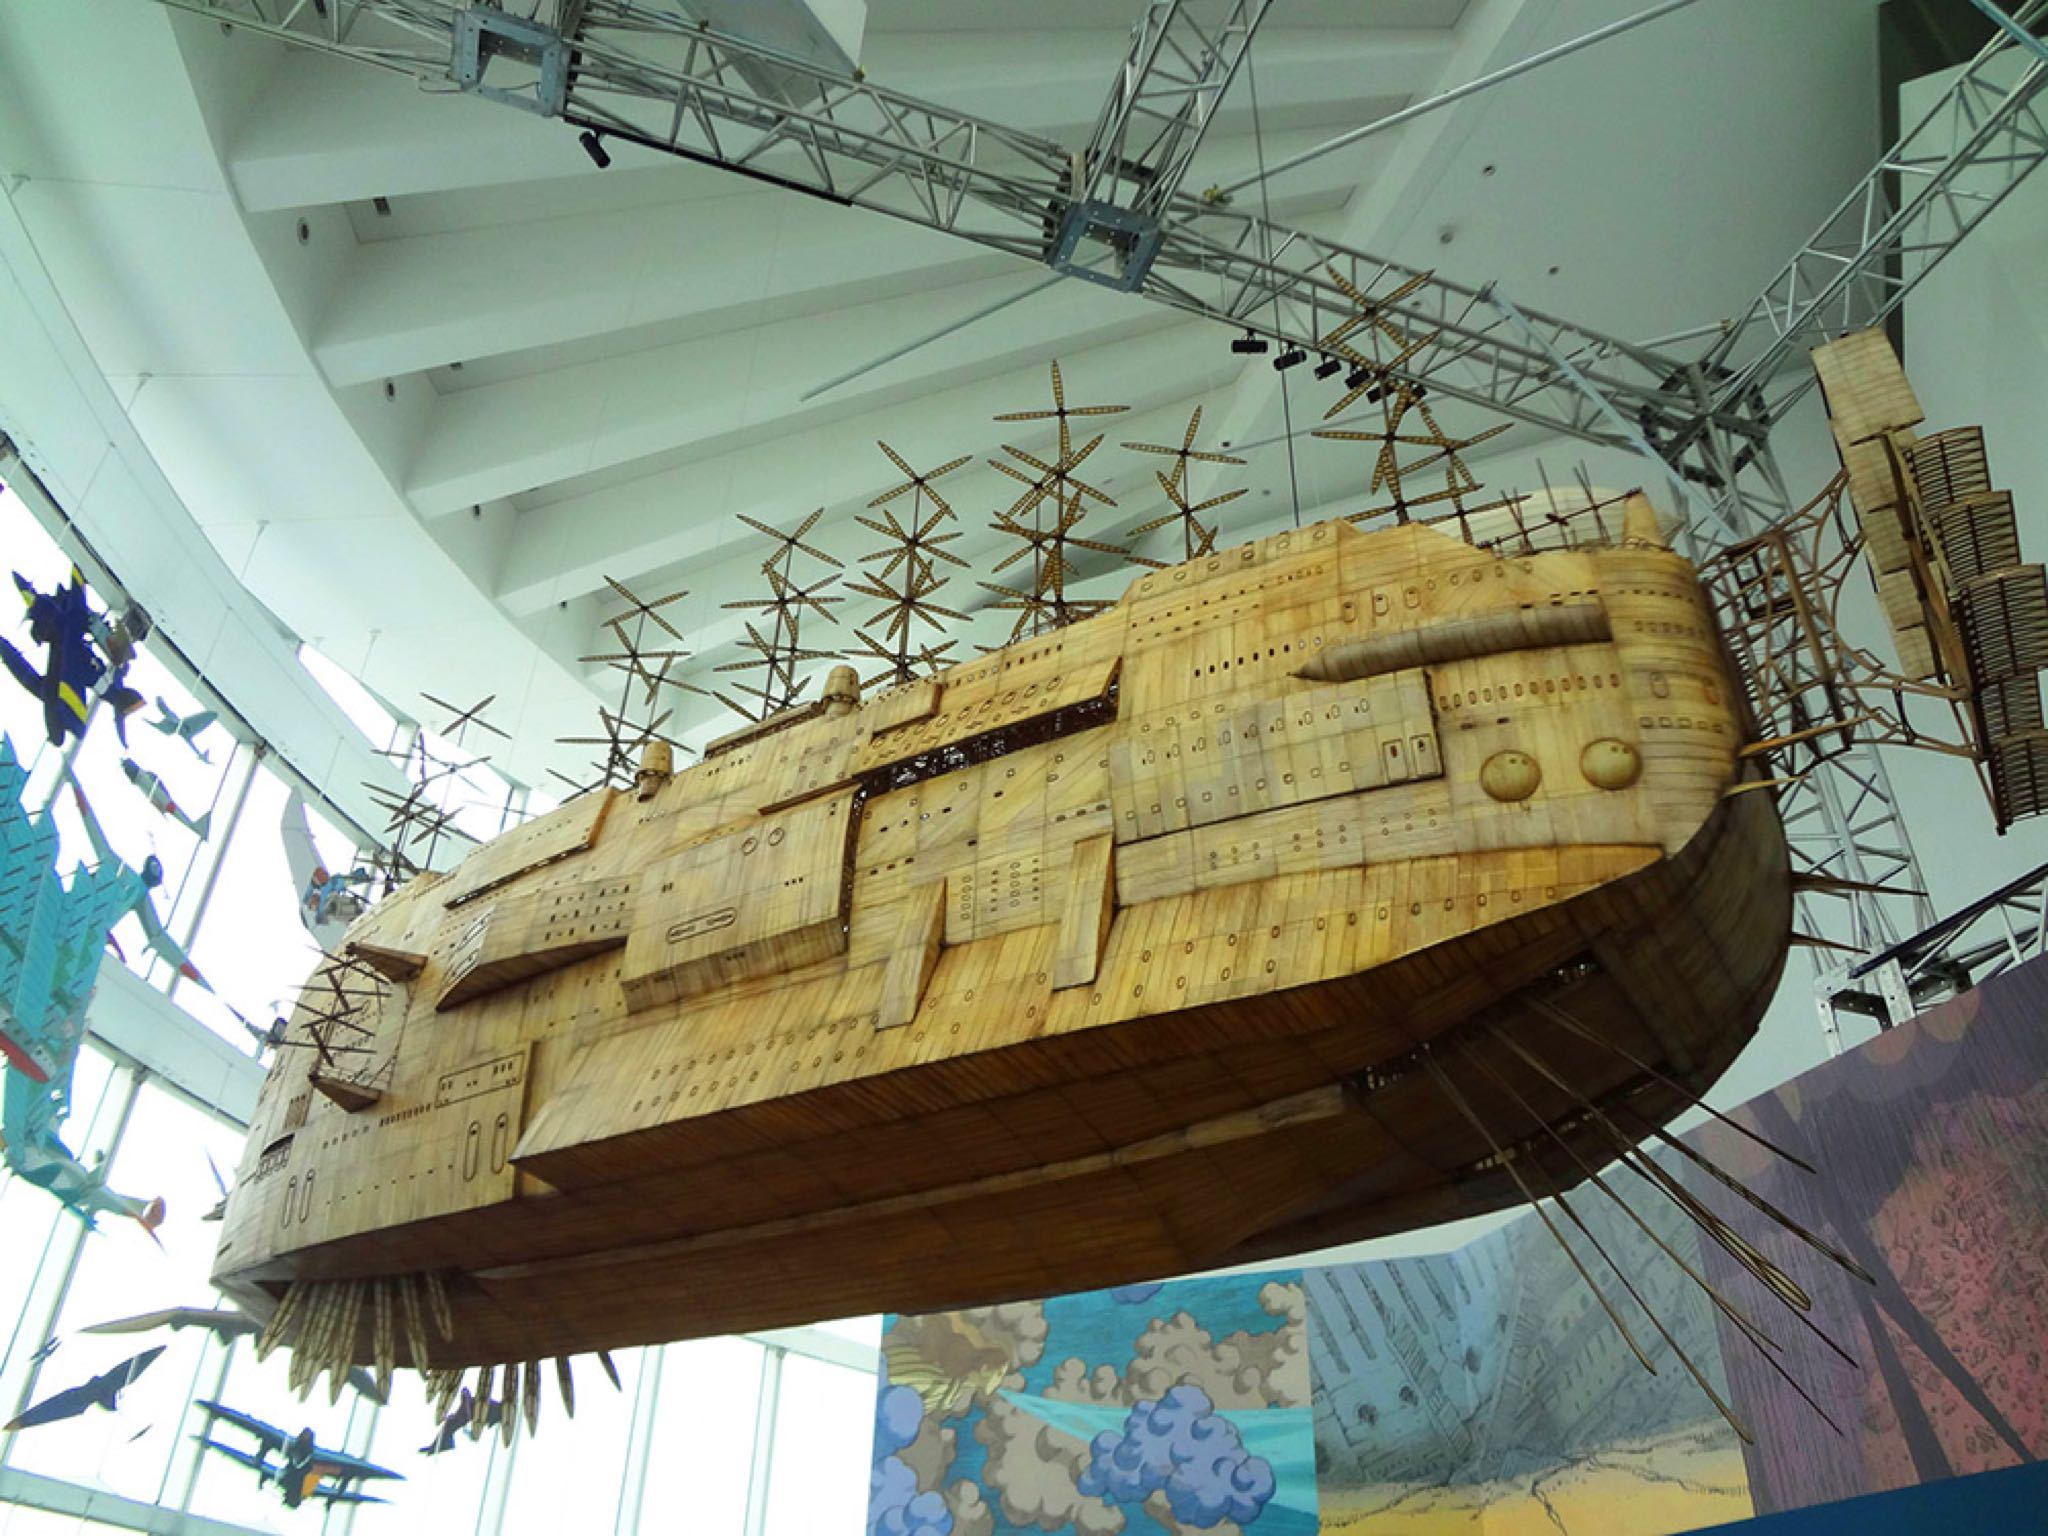 Studio Ghibli Castle in the Sky ship sculpture